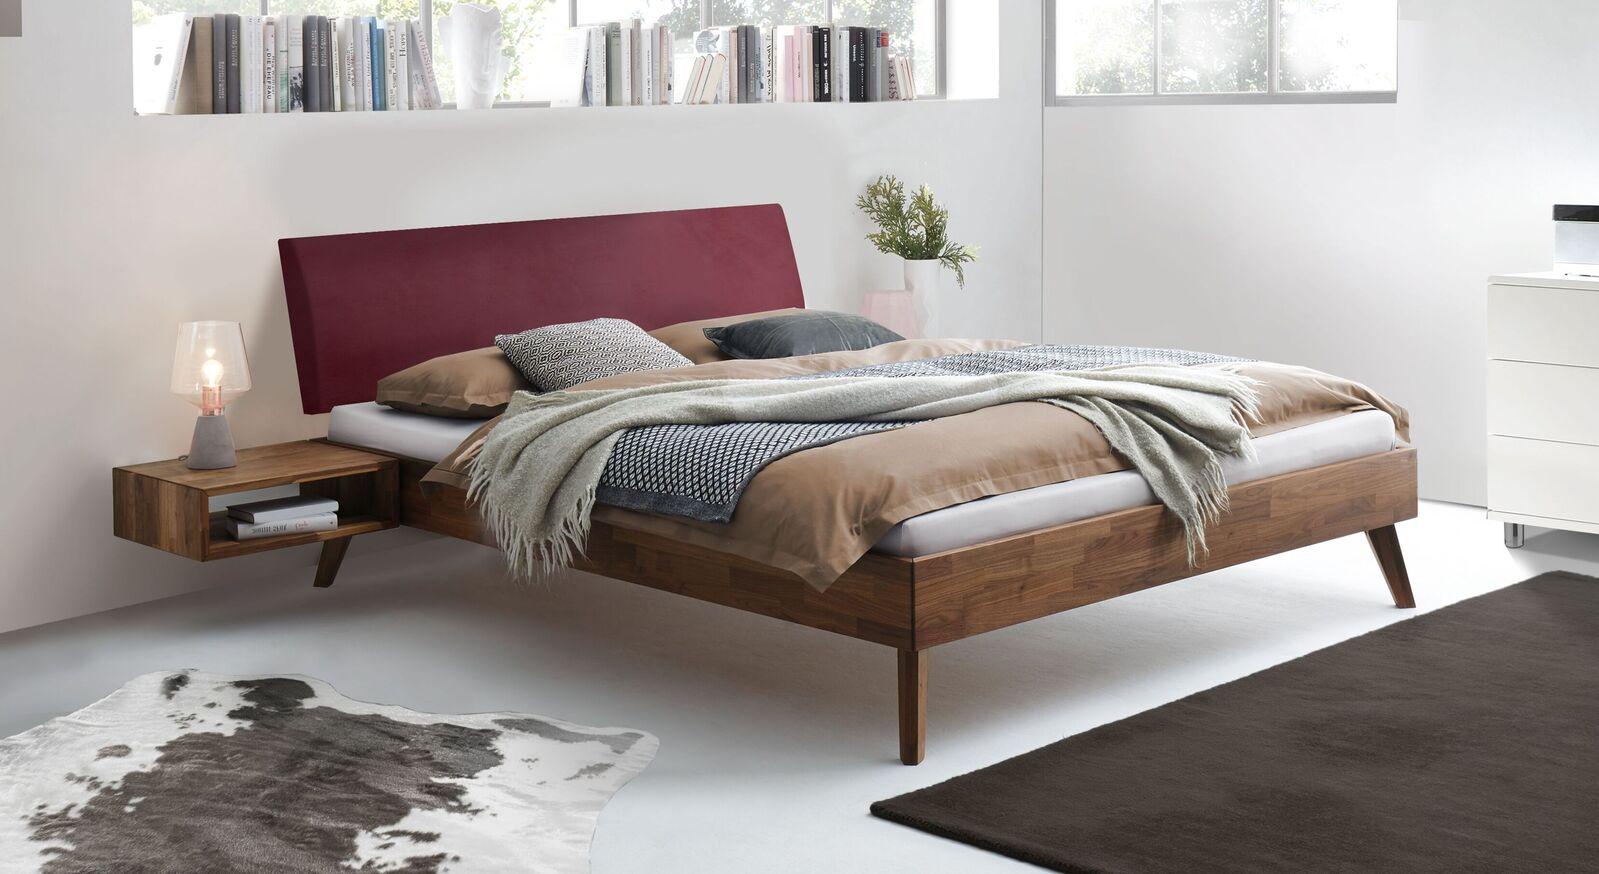 Bett Chiasa aus massivem Nussbaum-Holz